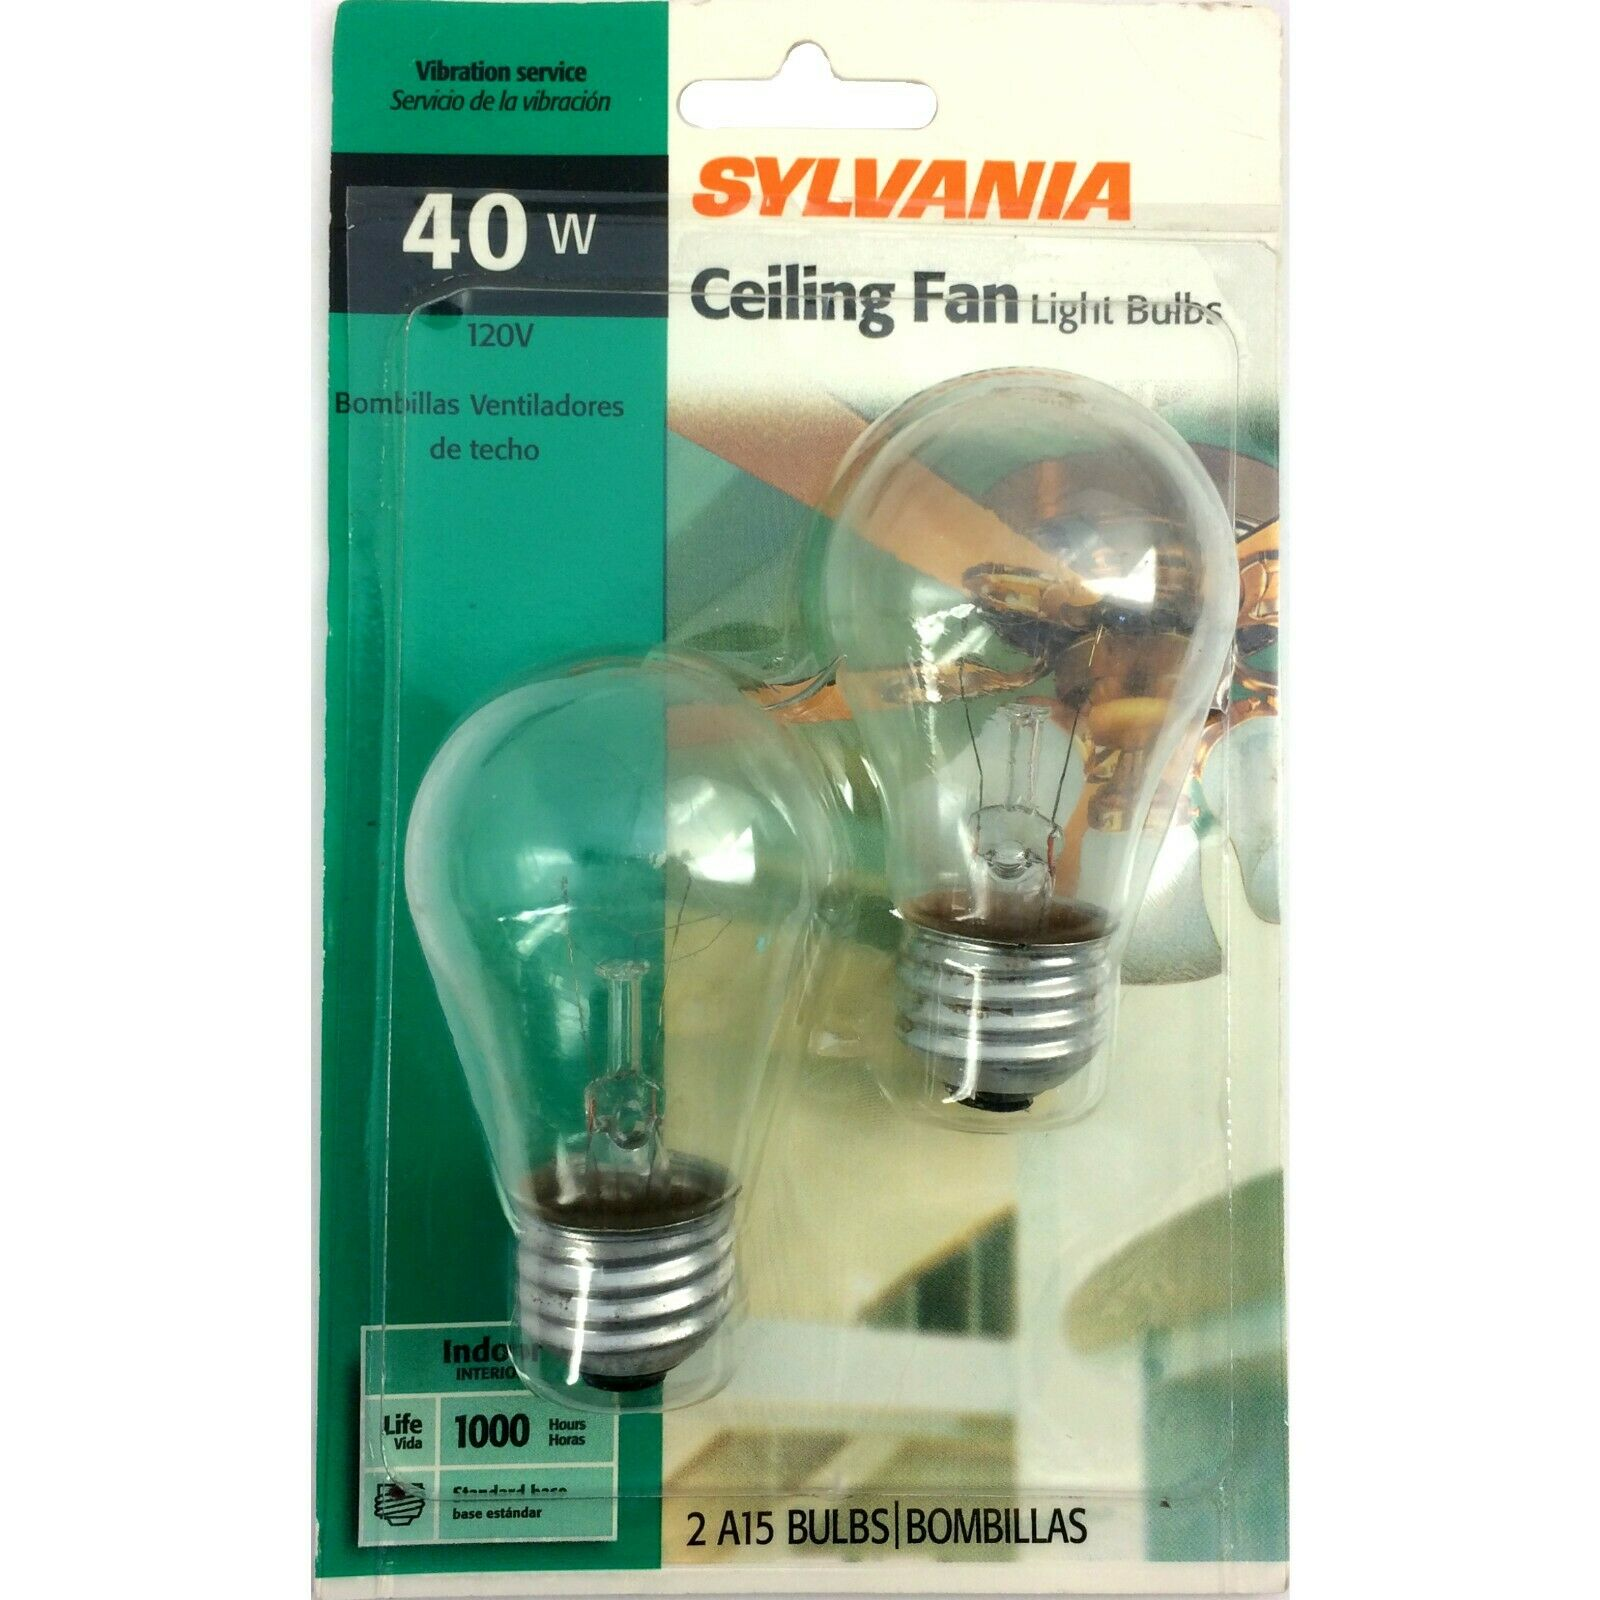 1 or 6 120v Sylvania Incandescent PKS OF 2 BULBS 60w or 40w